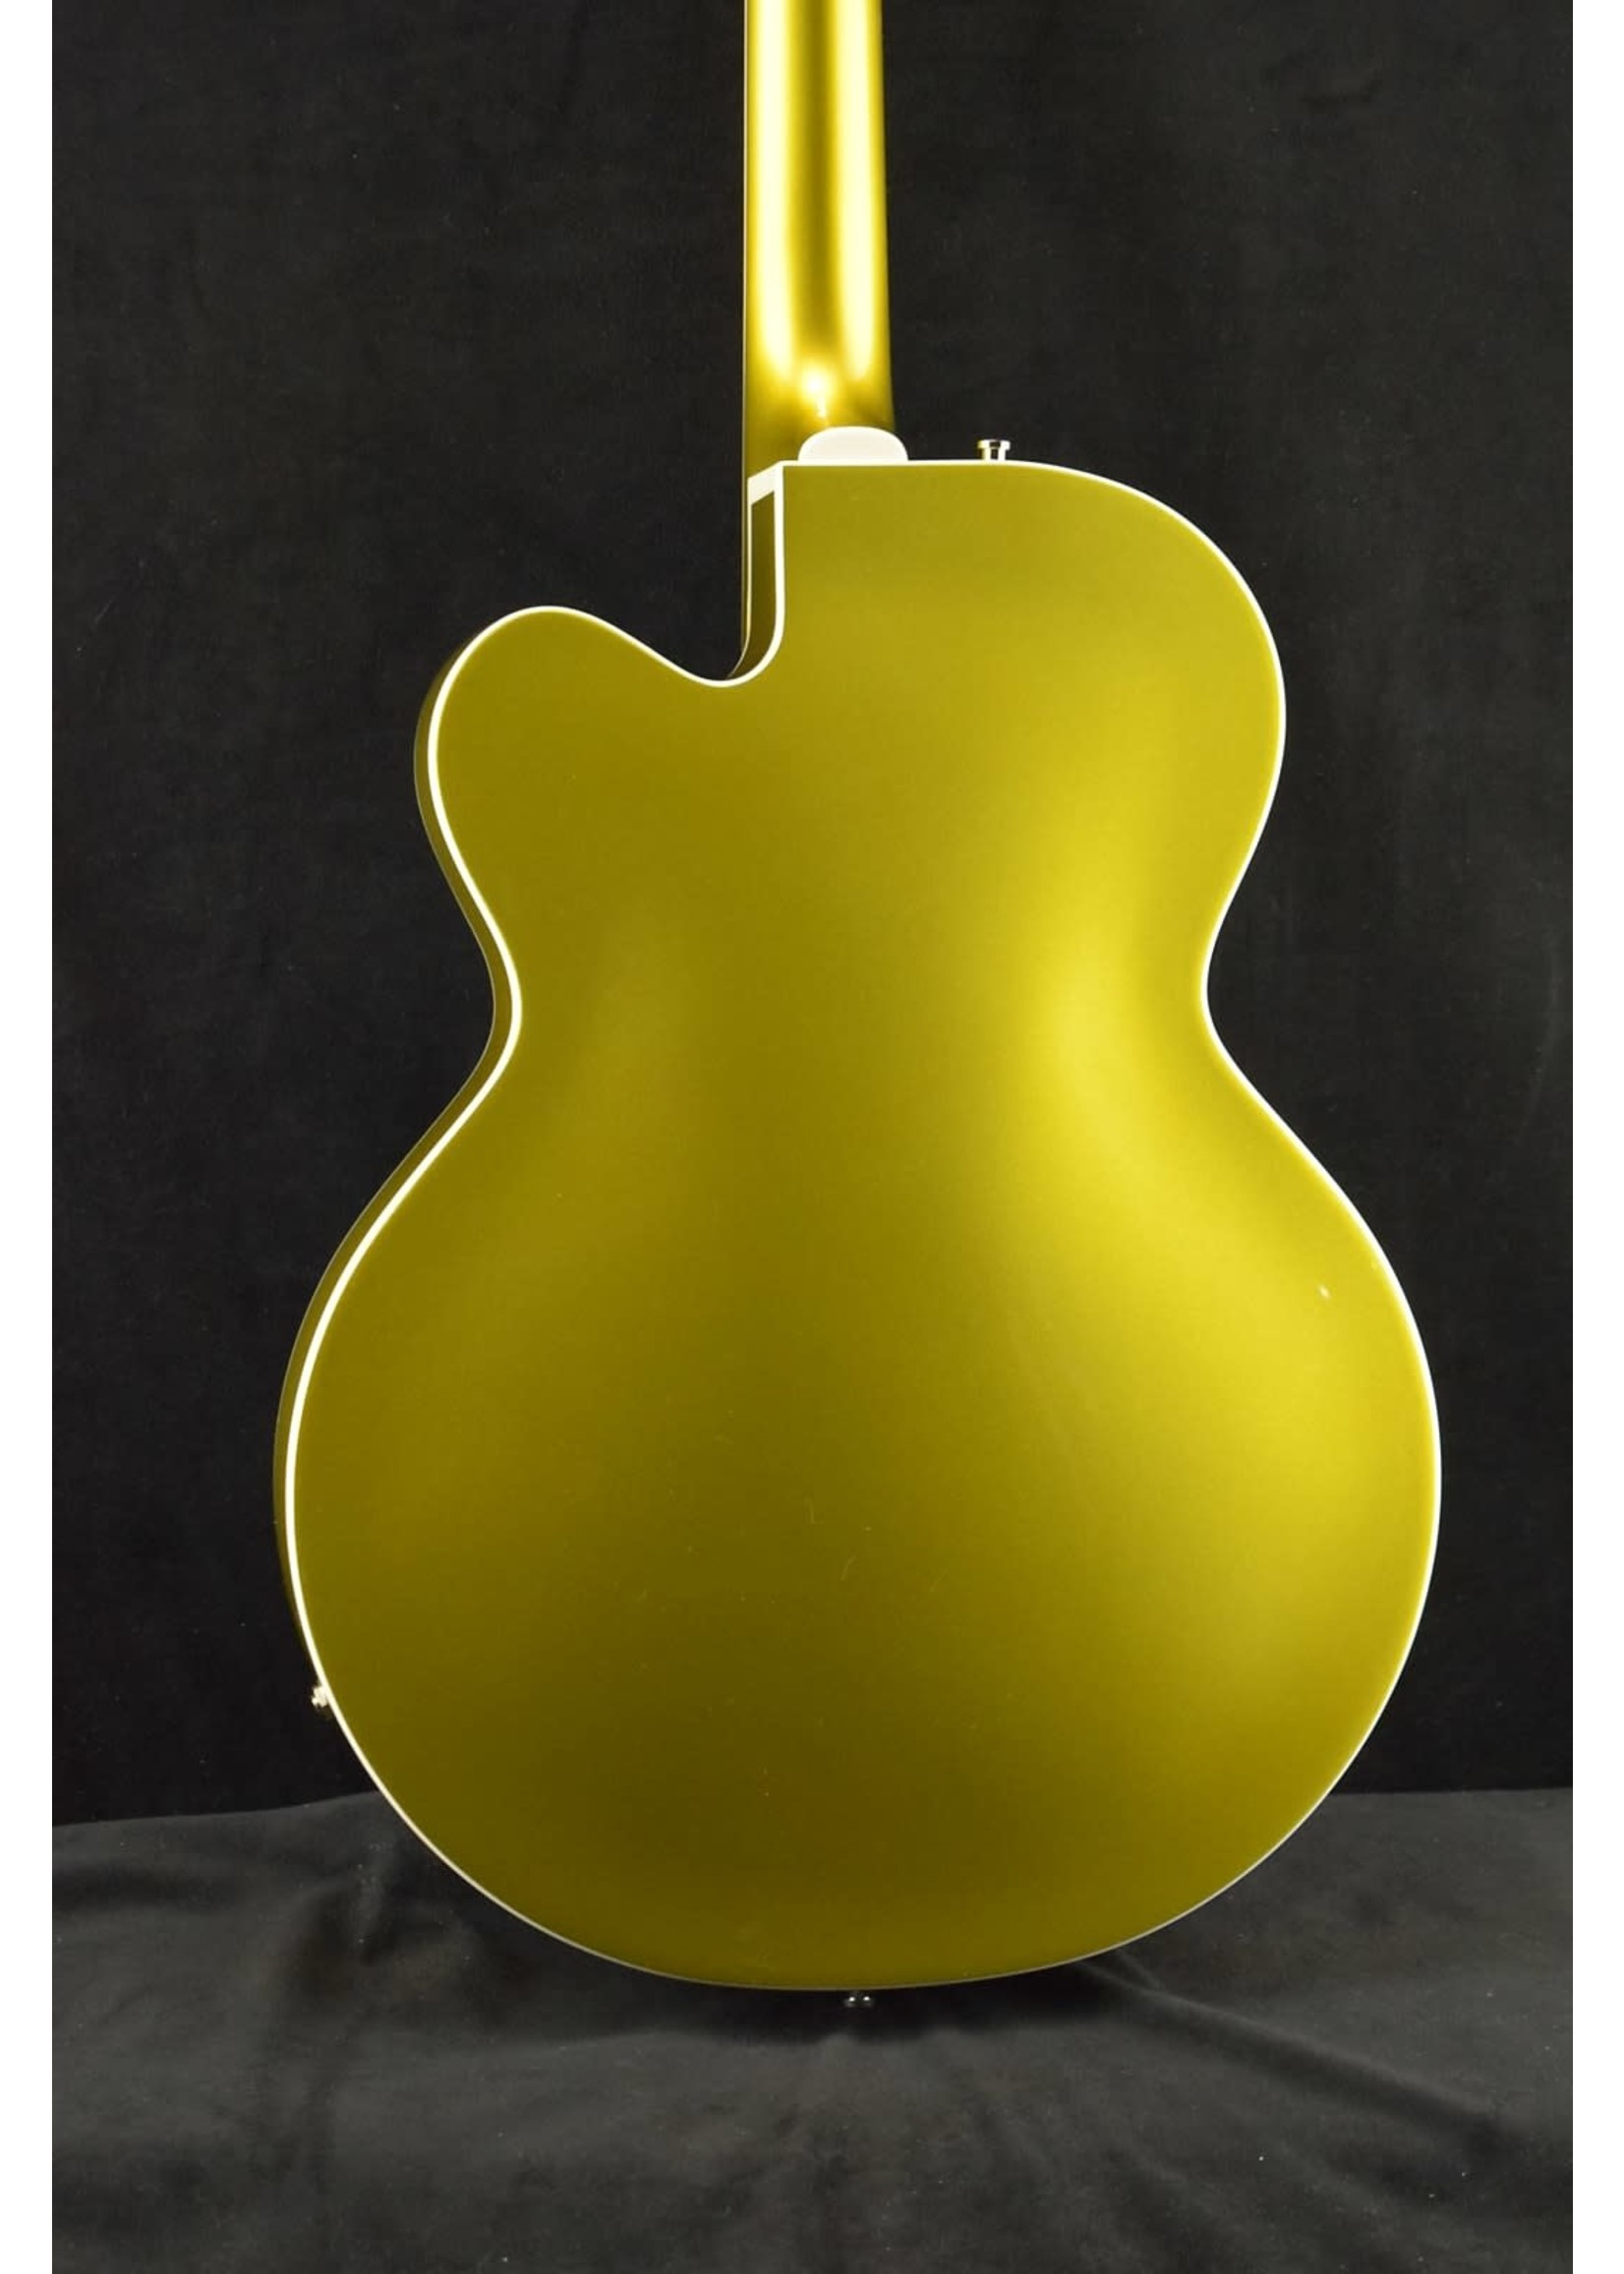 Gretsch Gretsch G6120T-HR Brian Setzer Signature Hot Rod Lime Gold